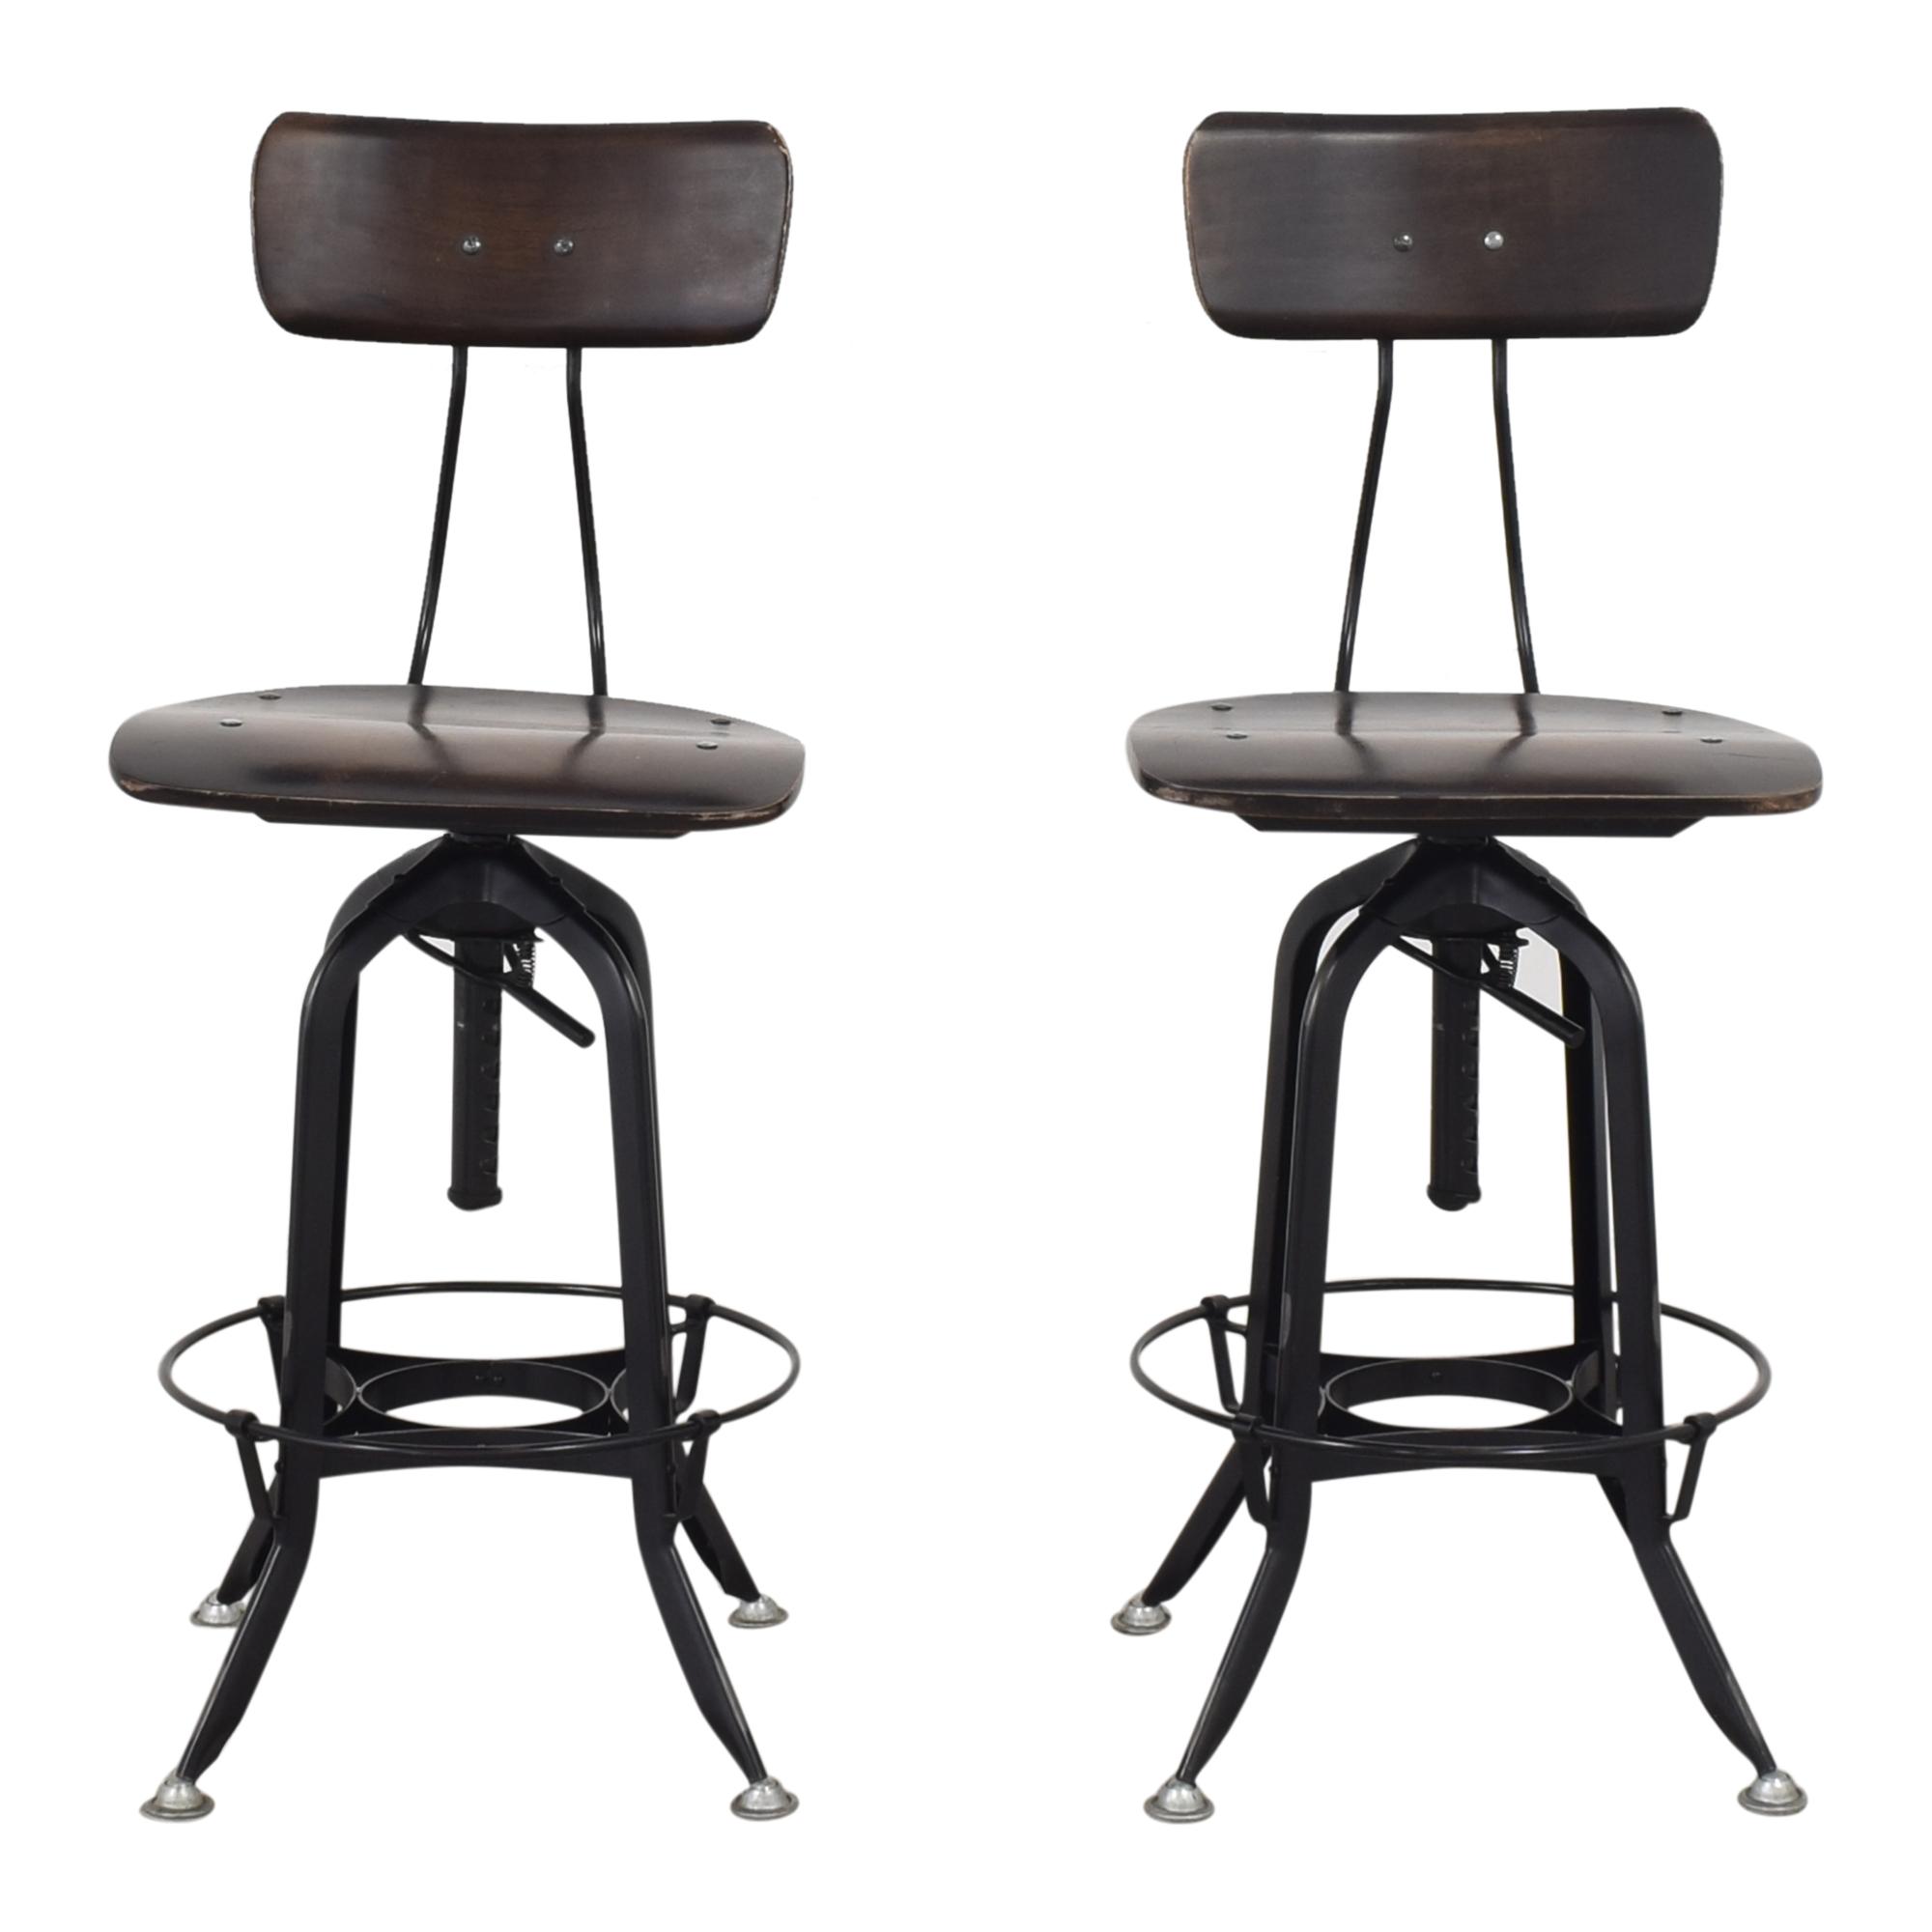 buy Restoration Hardware Restoration Hardware 1940s Vintage Toledo Bar Chairs online